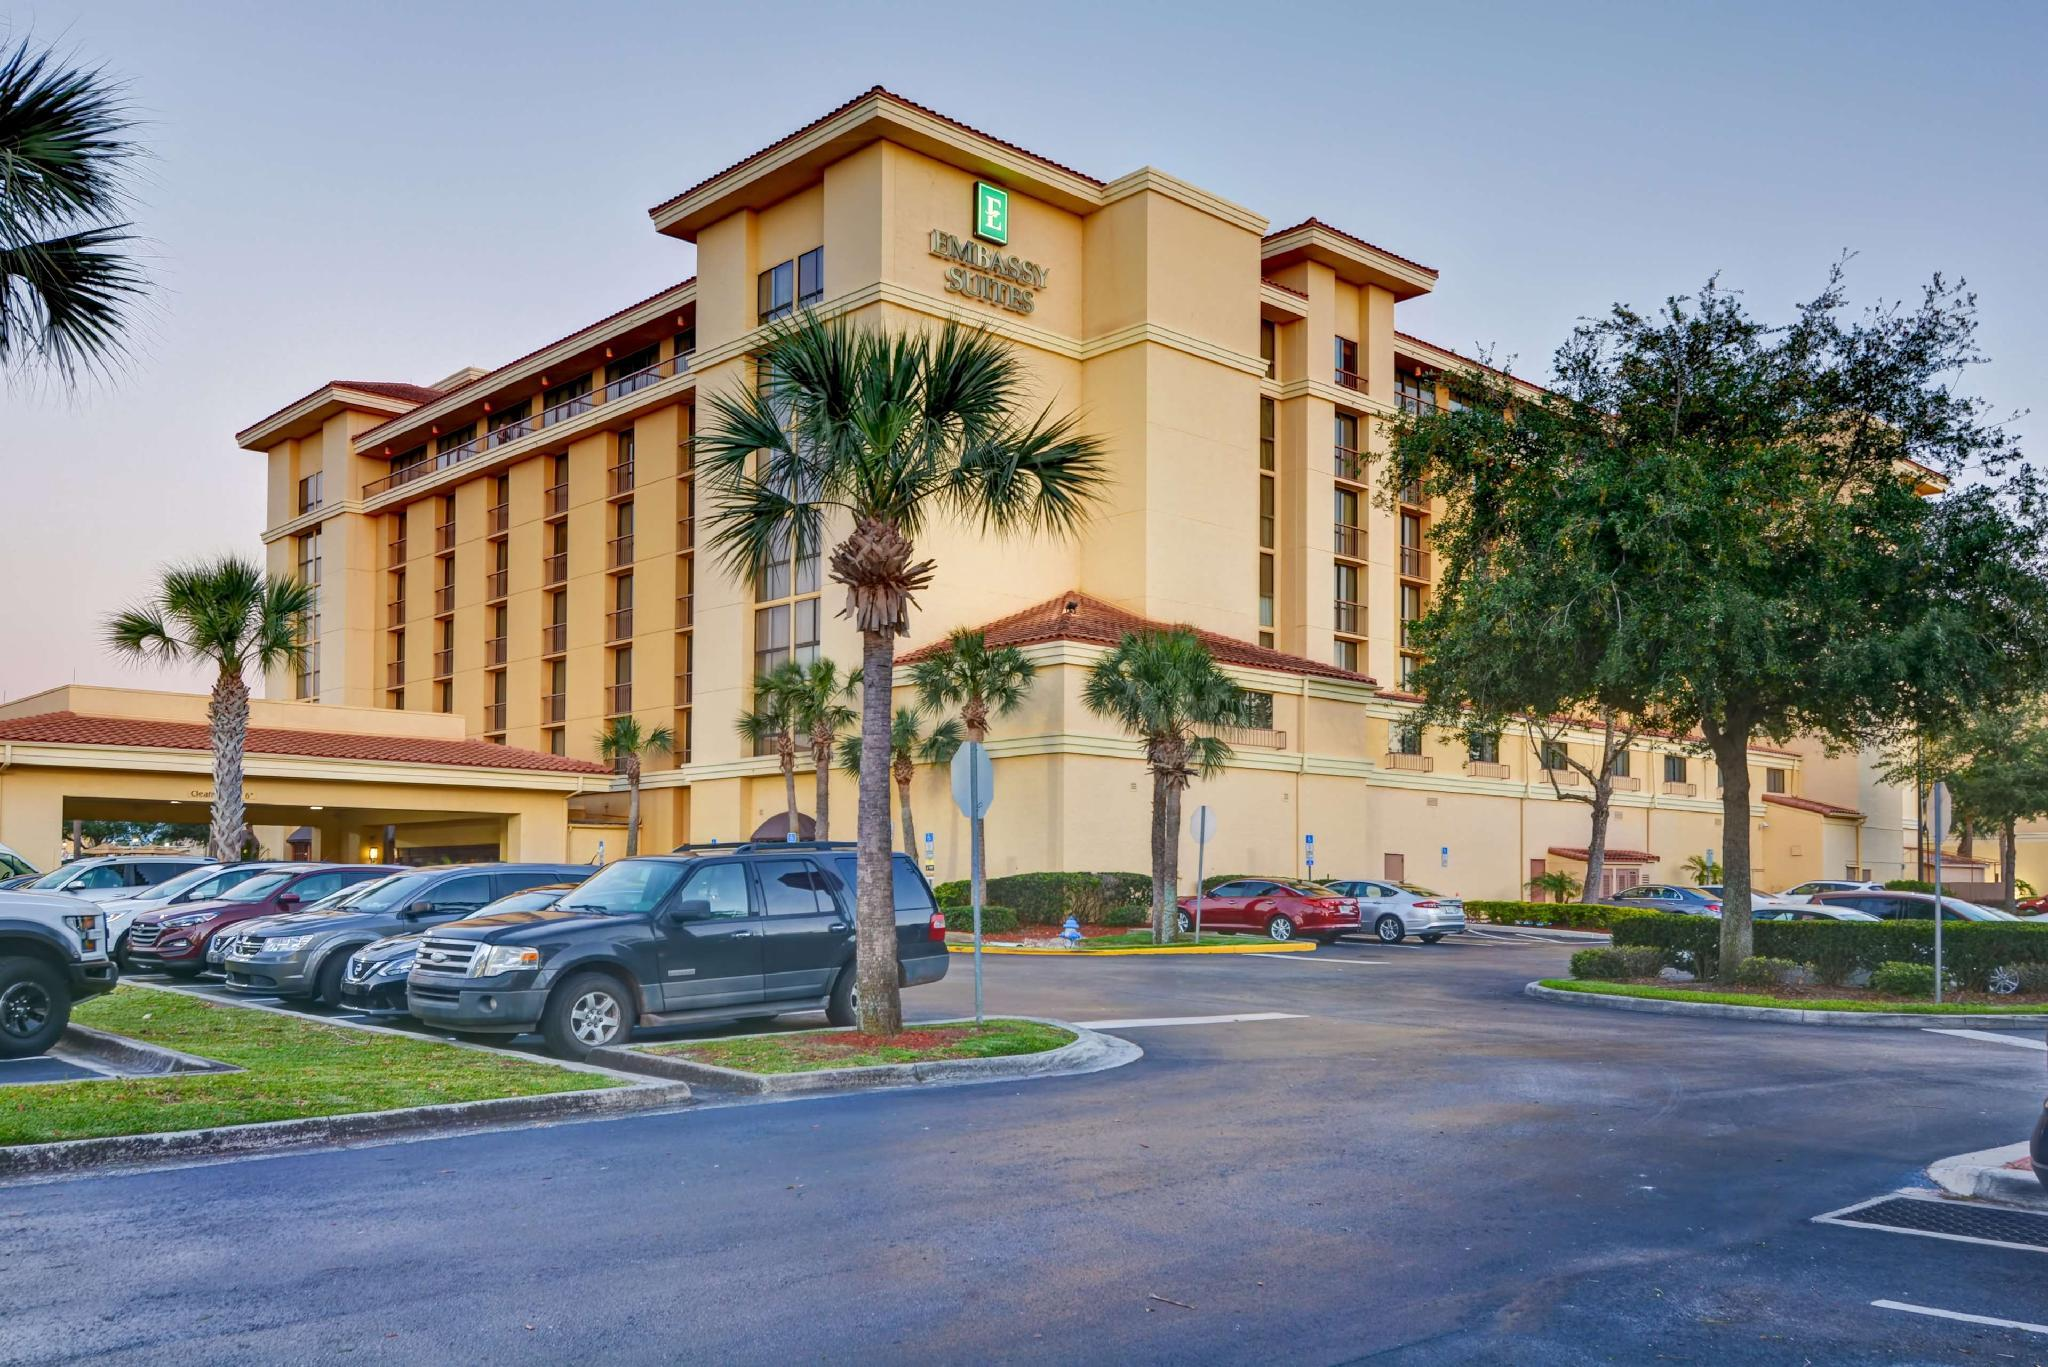 Embassy Suites Orlando North Hotel